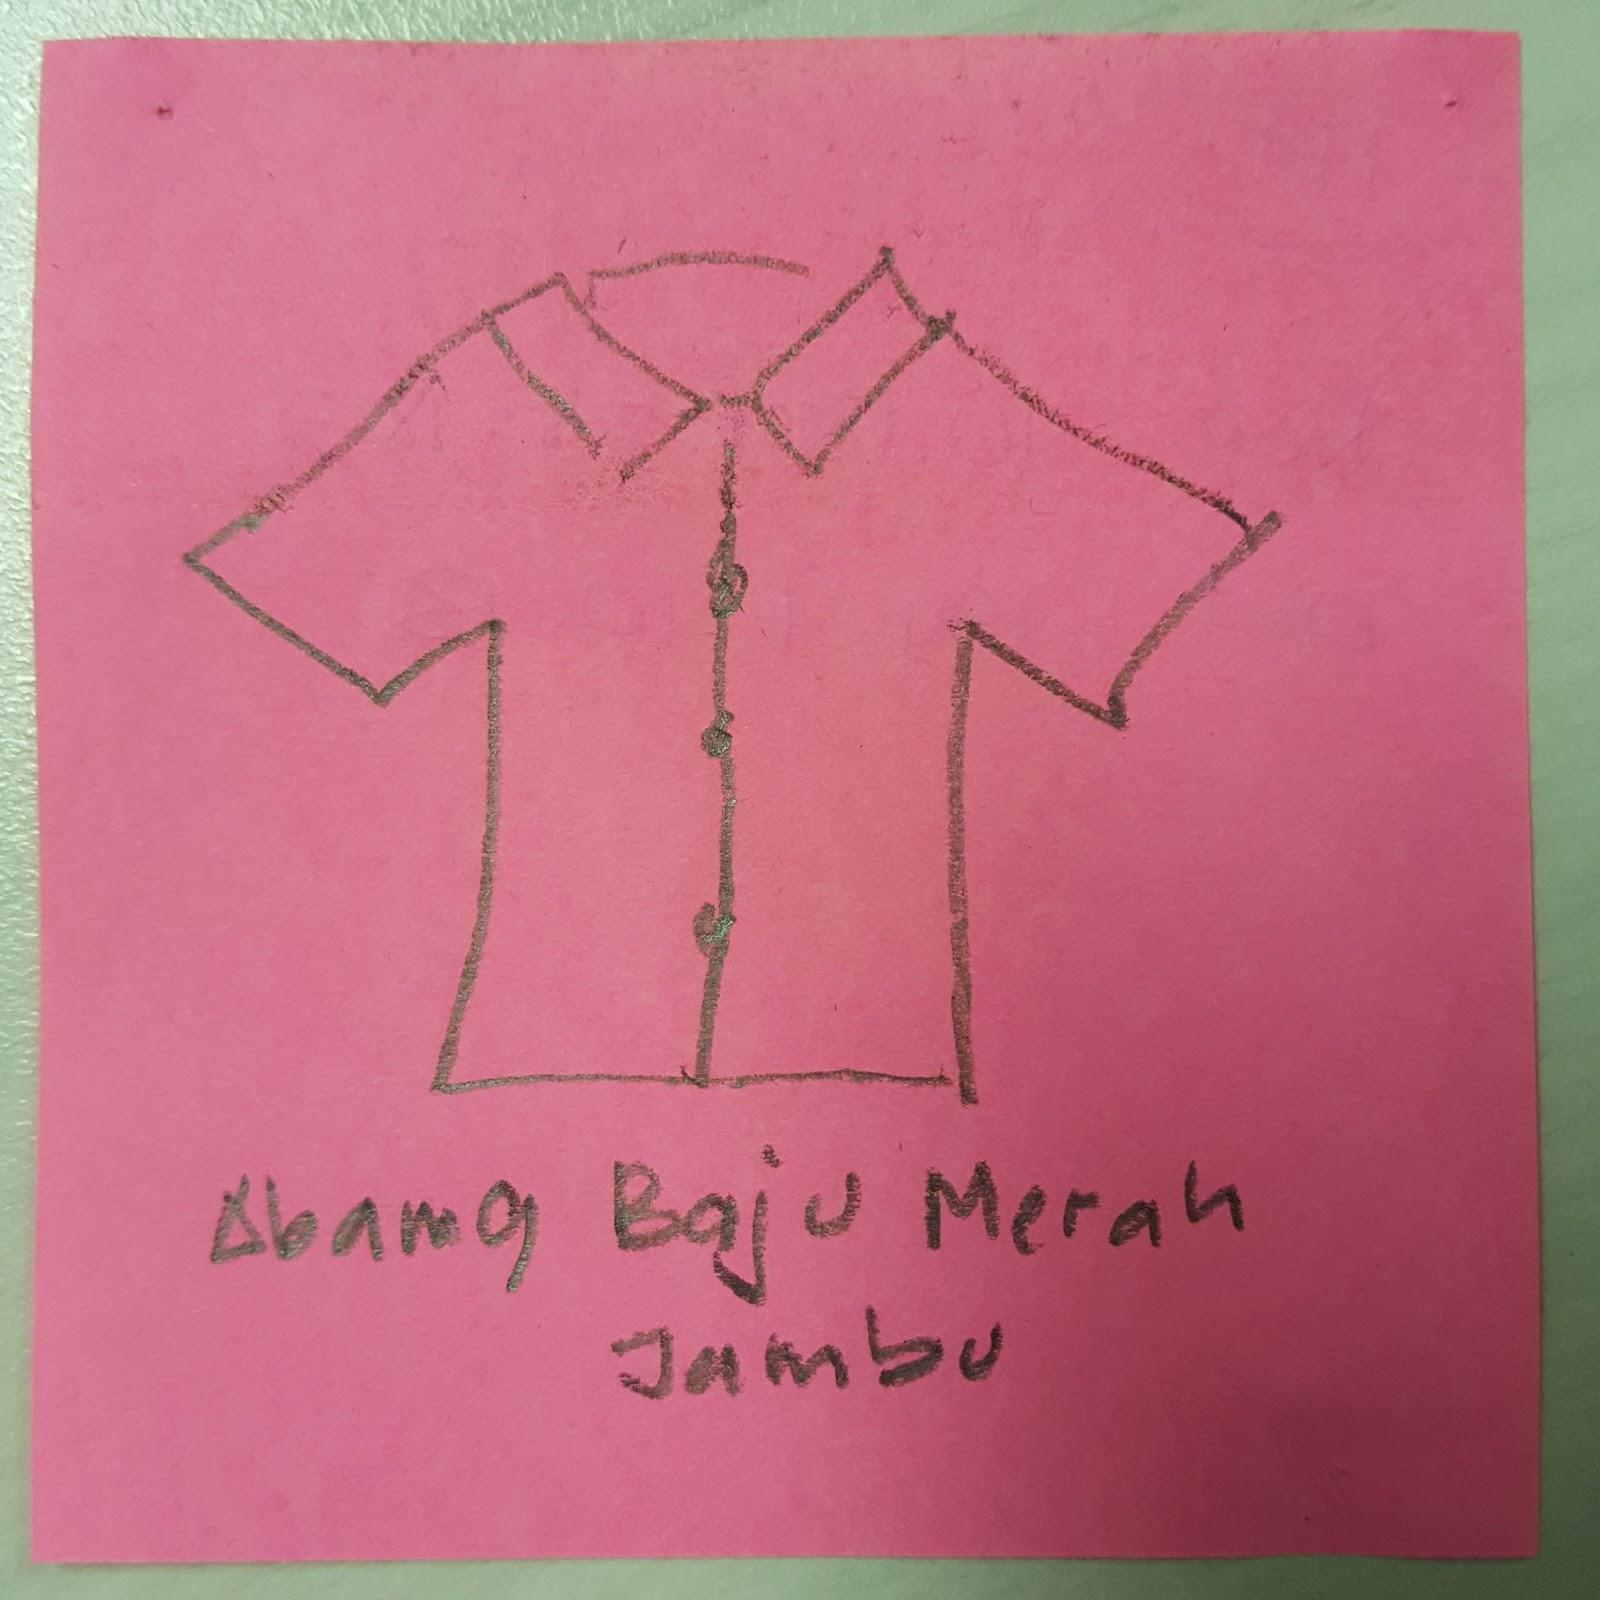 Abang Baju Merah Jambu